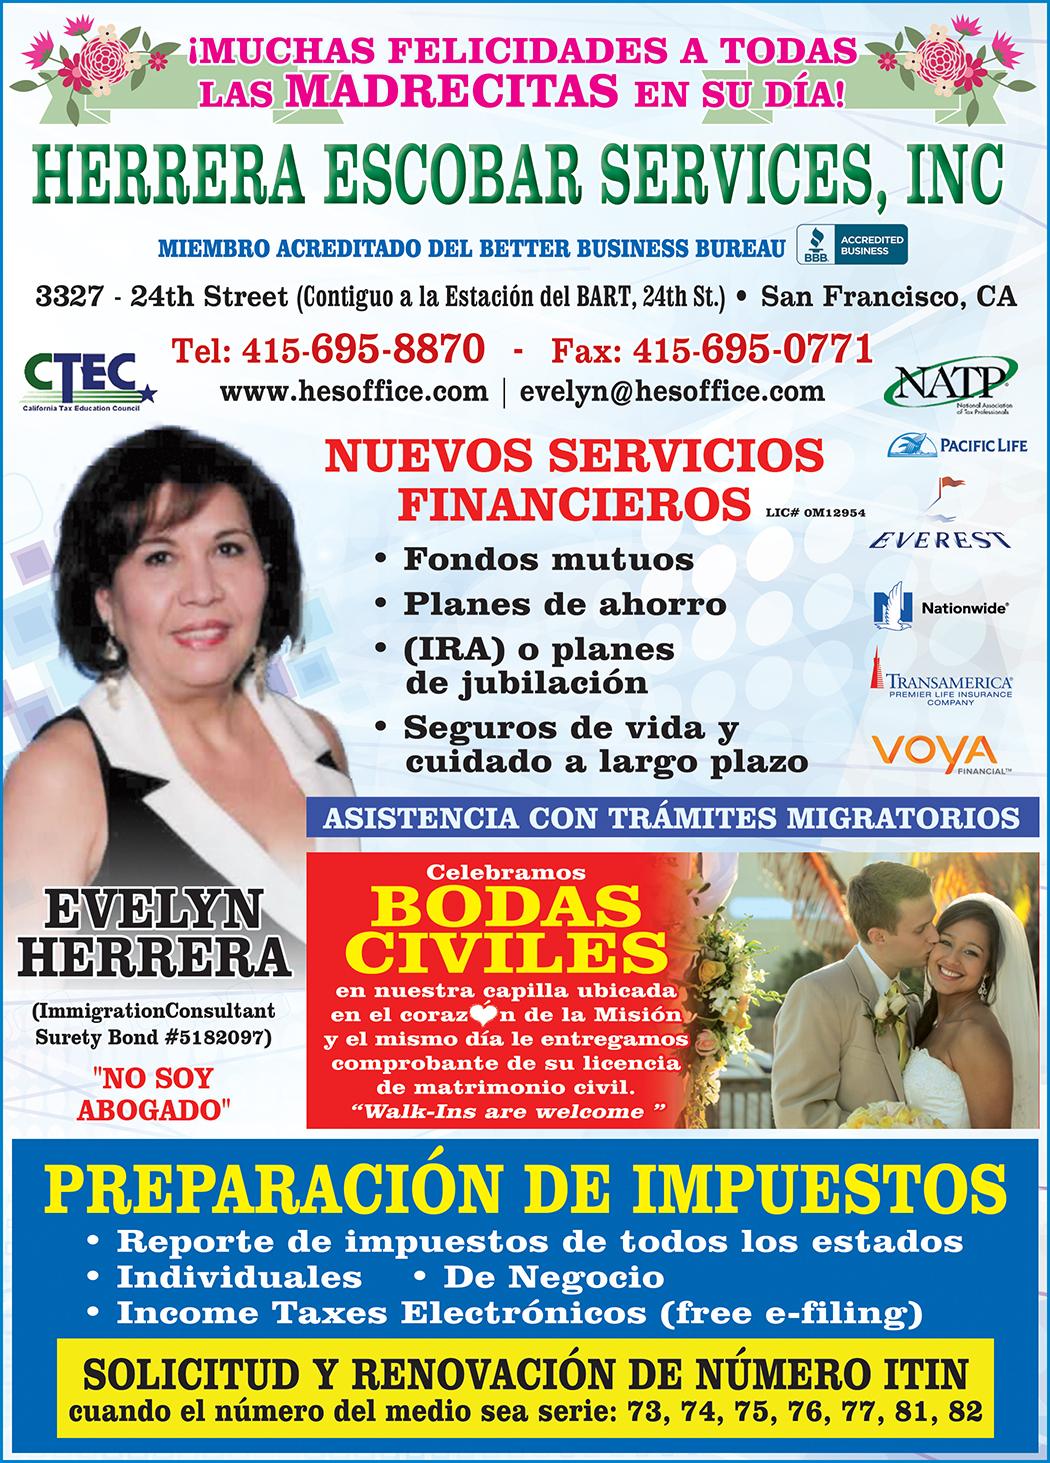 Herrera Escobar 1 Pag - MAY0 2019 copy.jpg